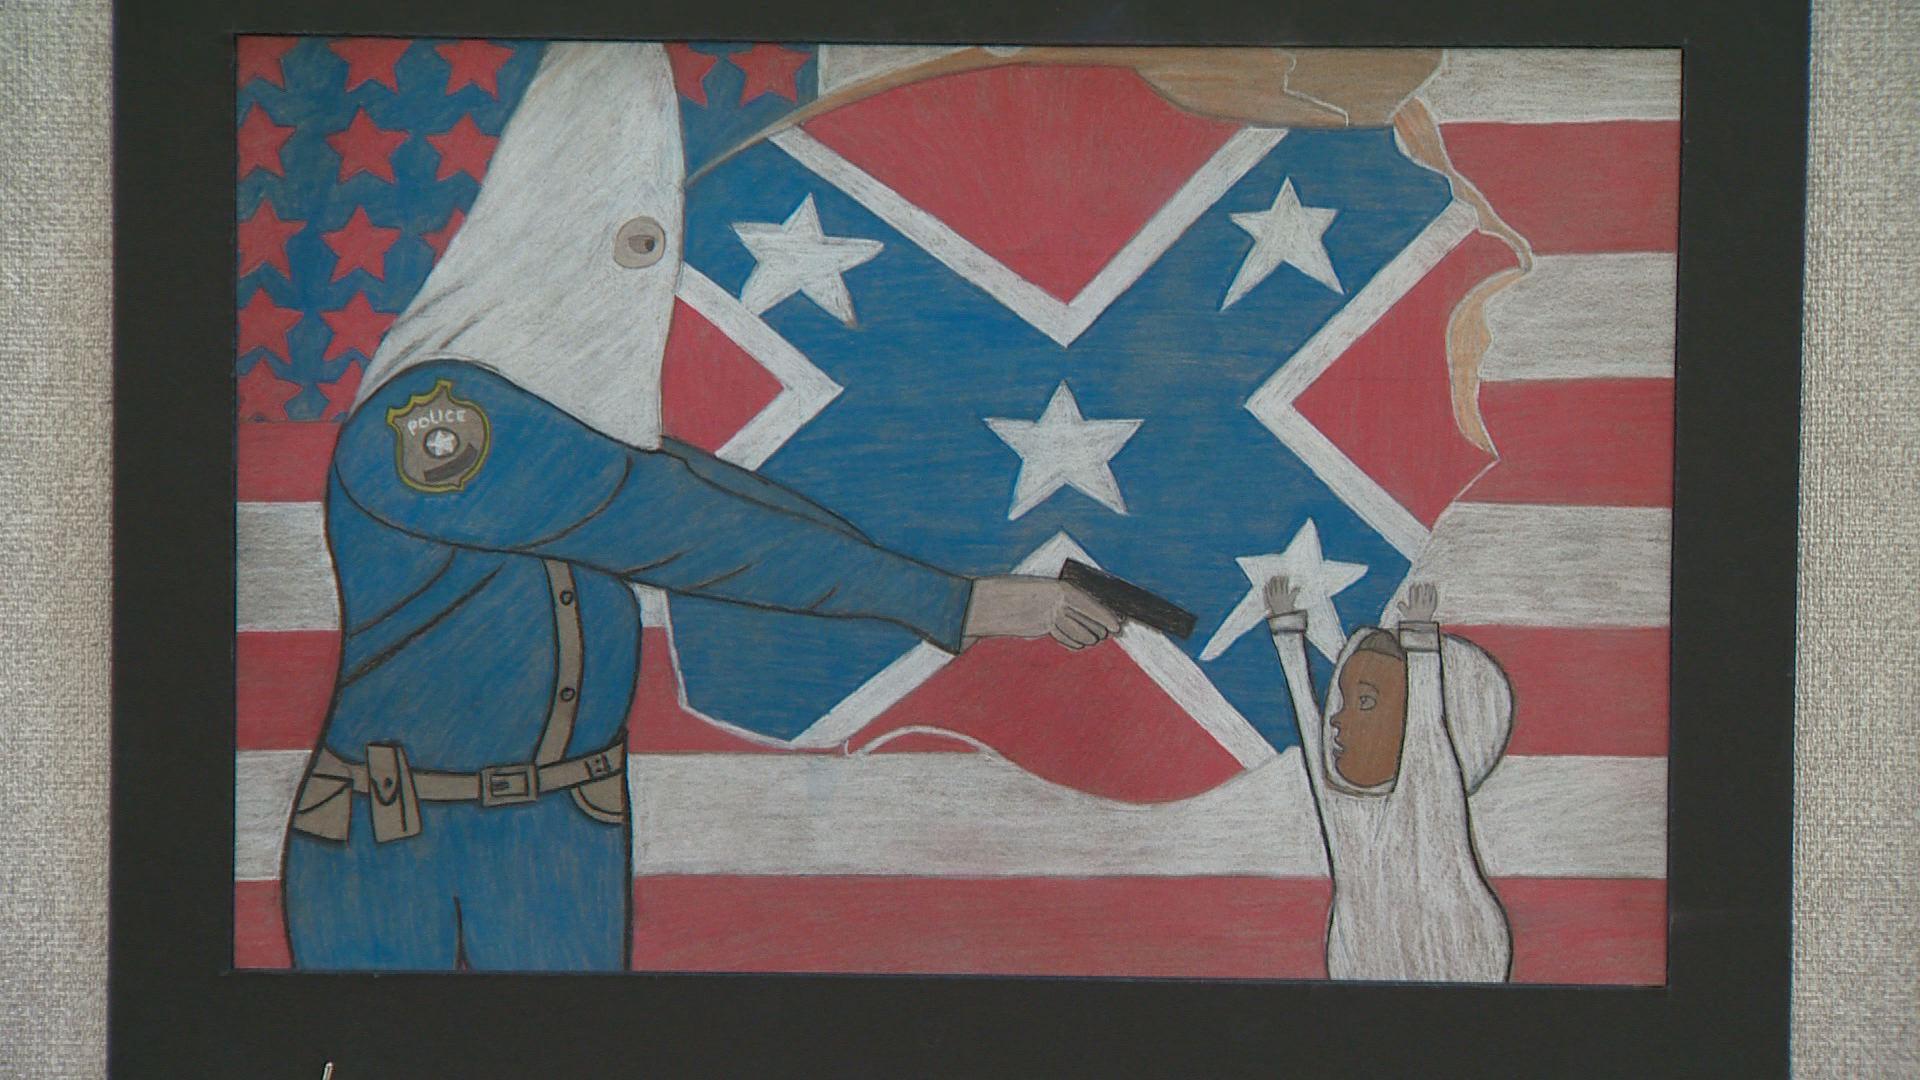 Denver Student's Art Work, withdrawn